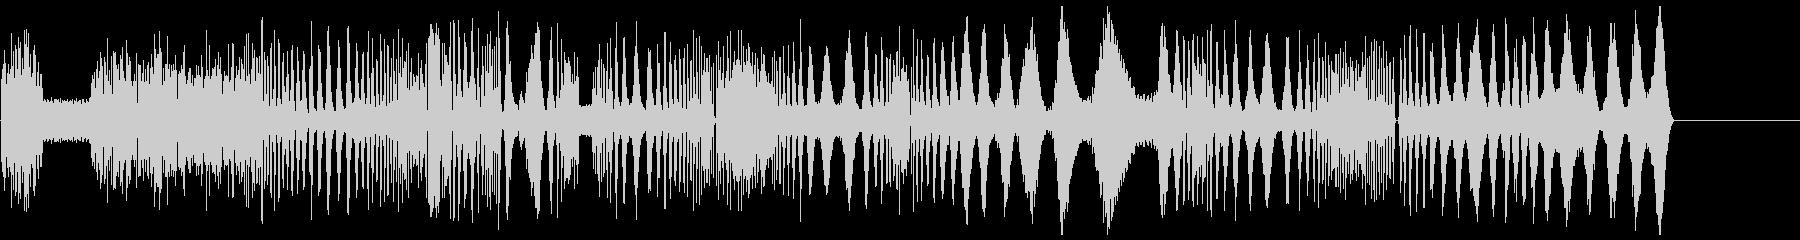 KYMA電解液パイプの未再生の波形